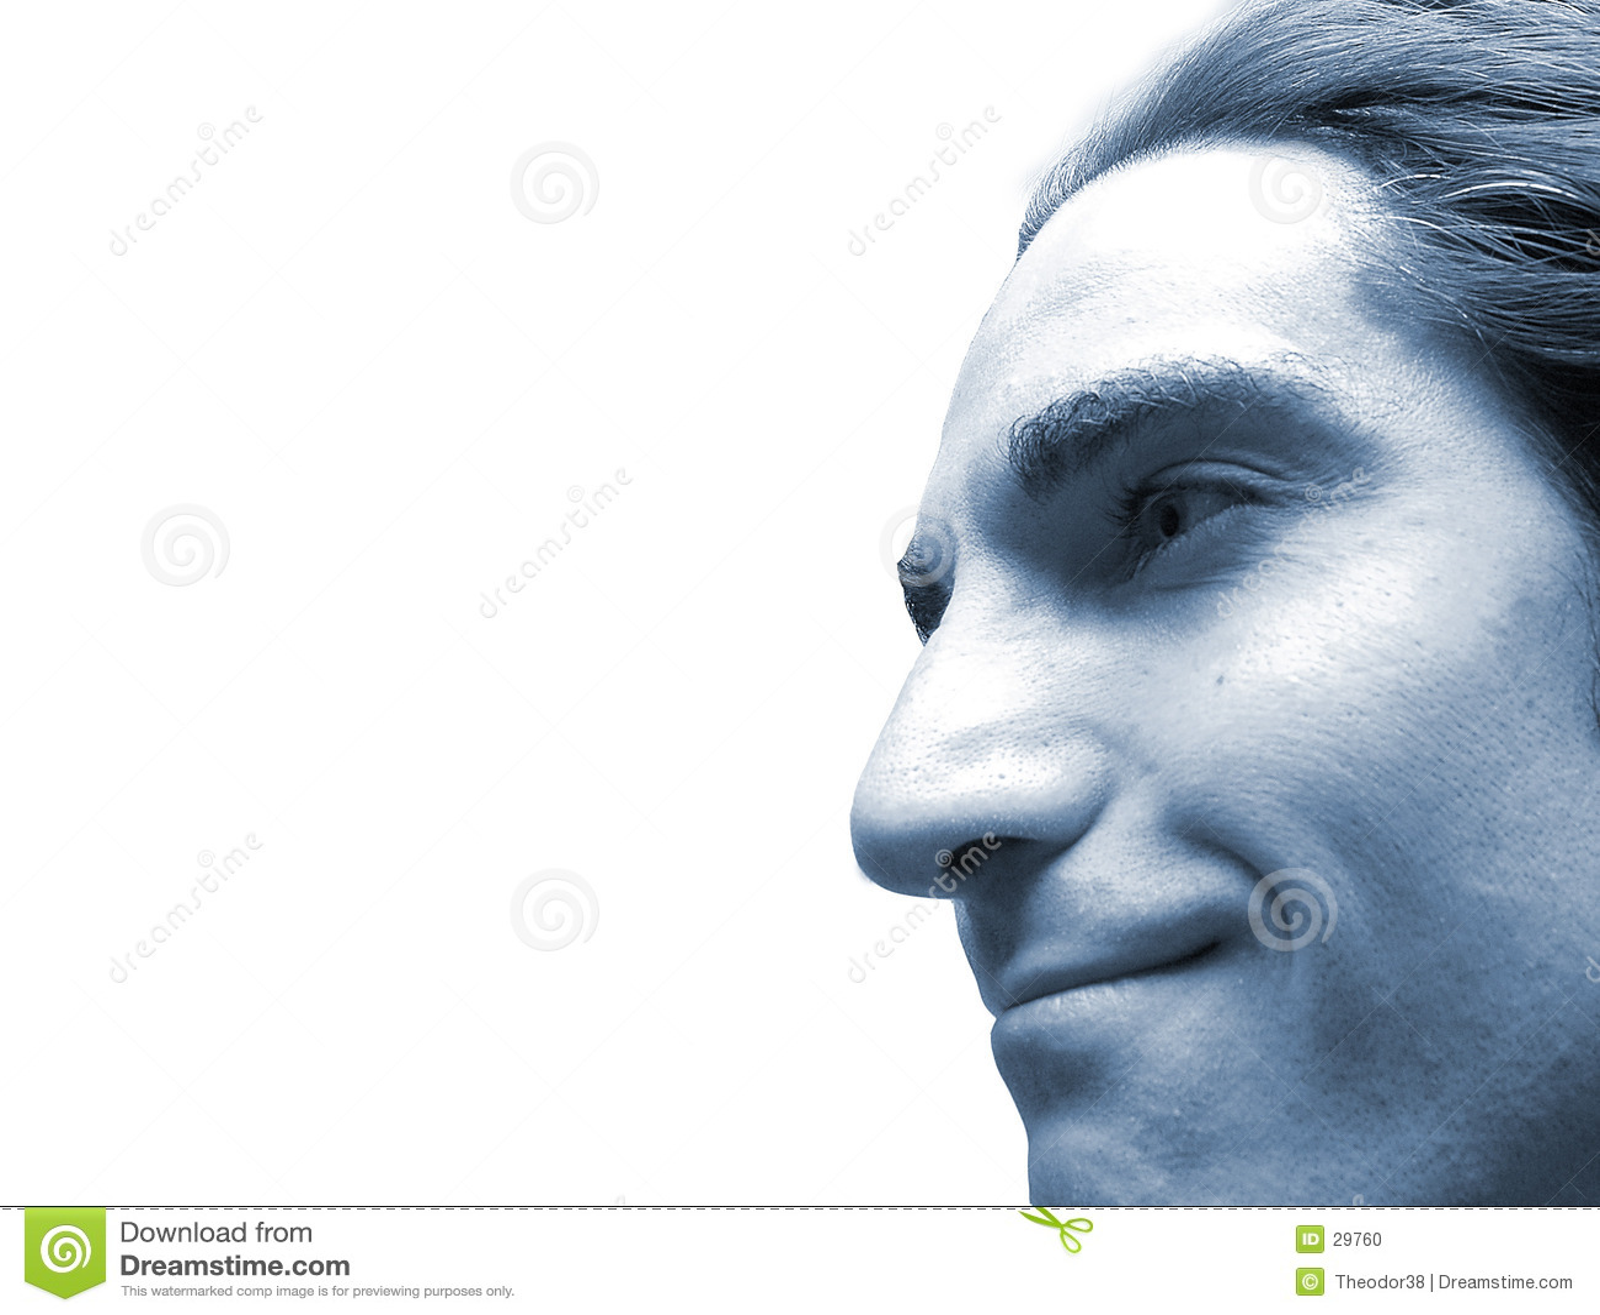 Gesicht im Blau